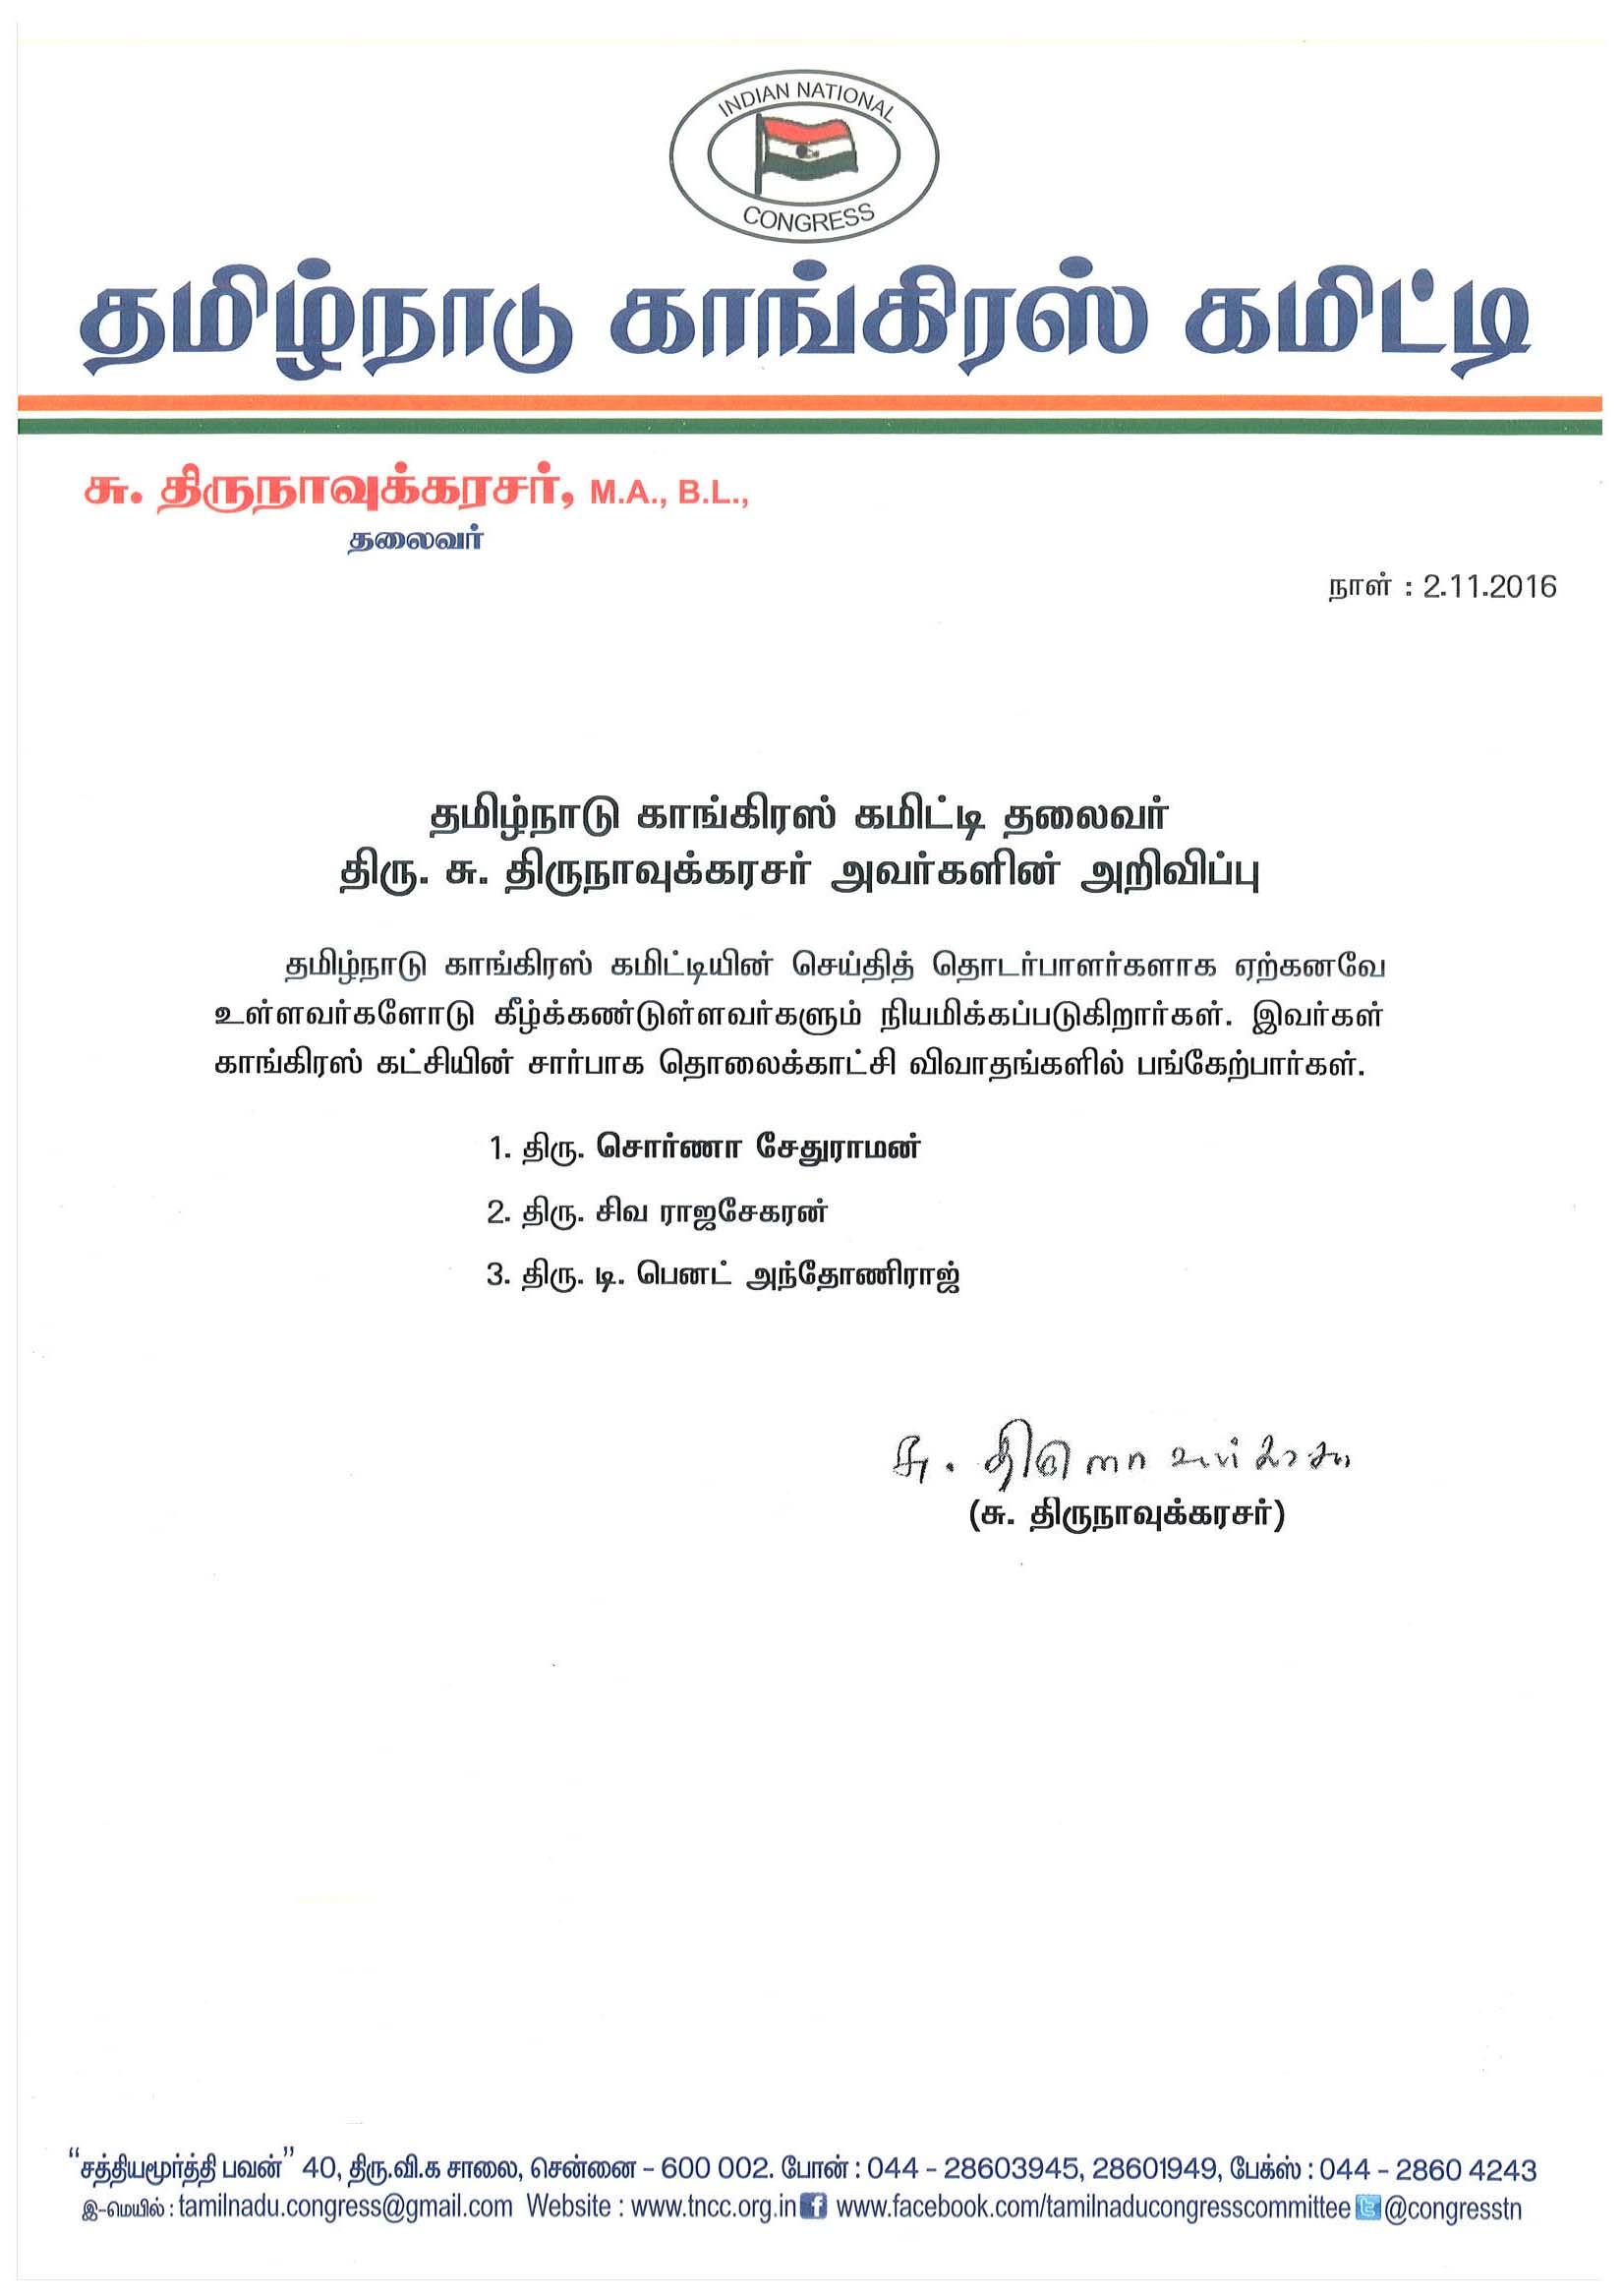 tncc-presidents-announcement-2-11-2016